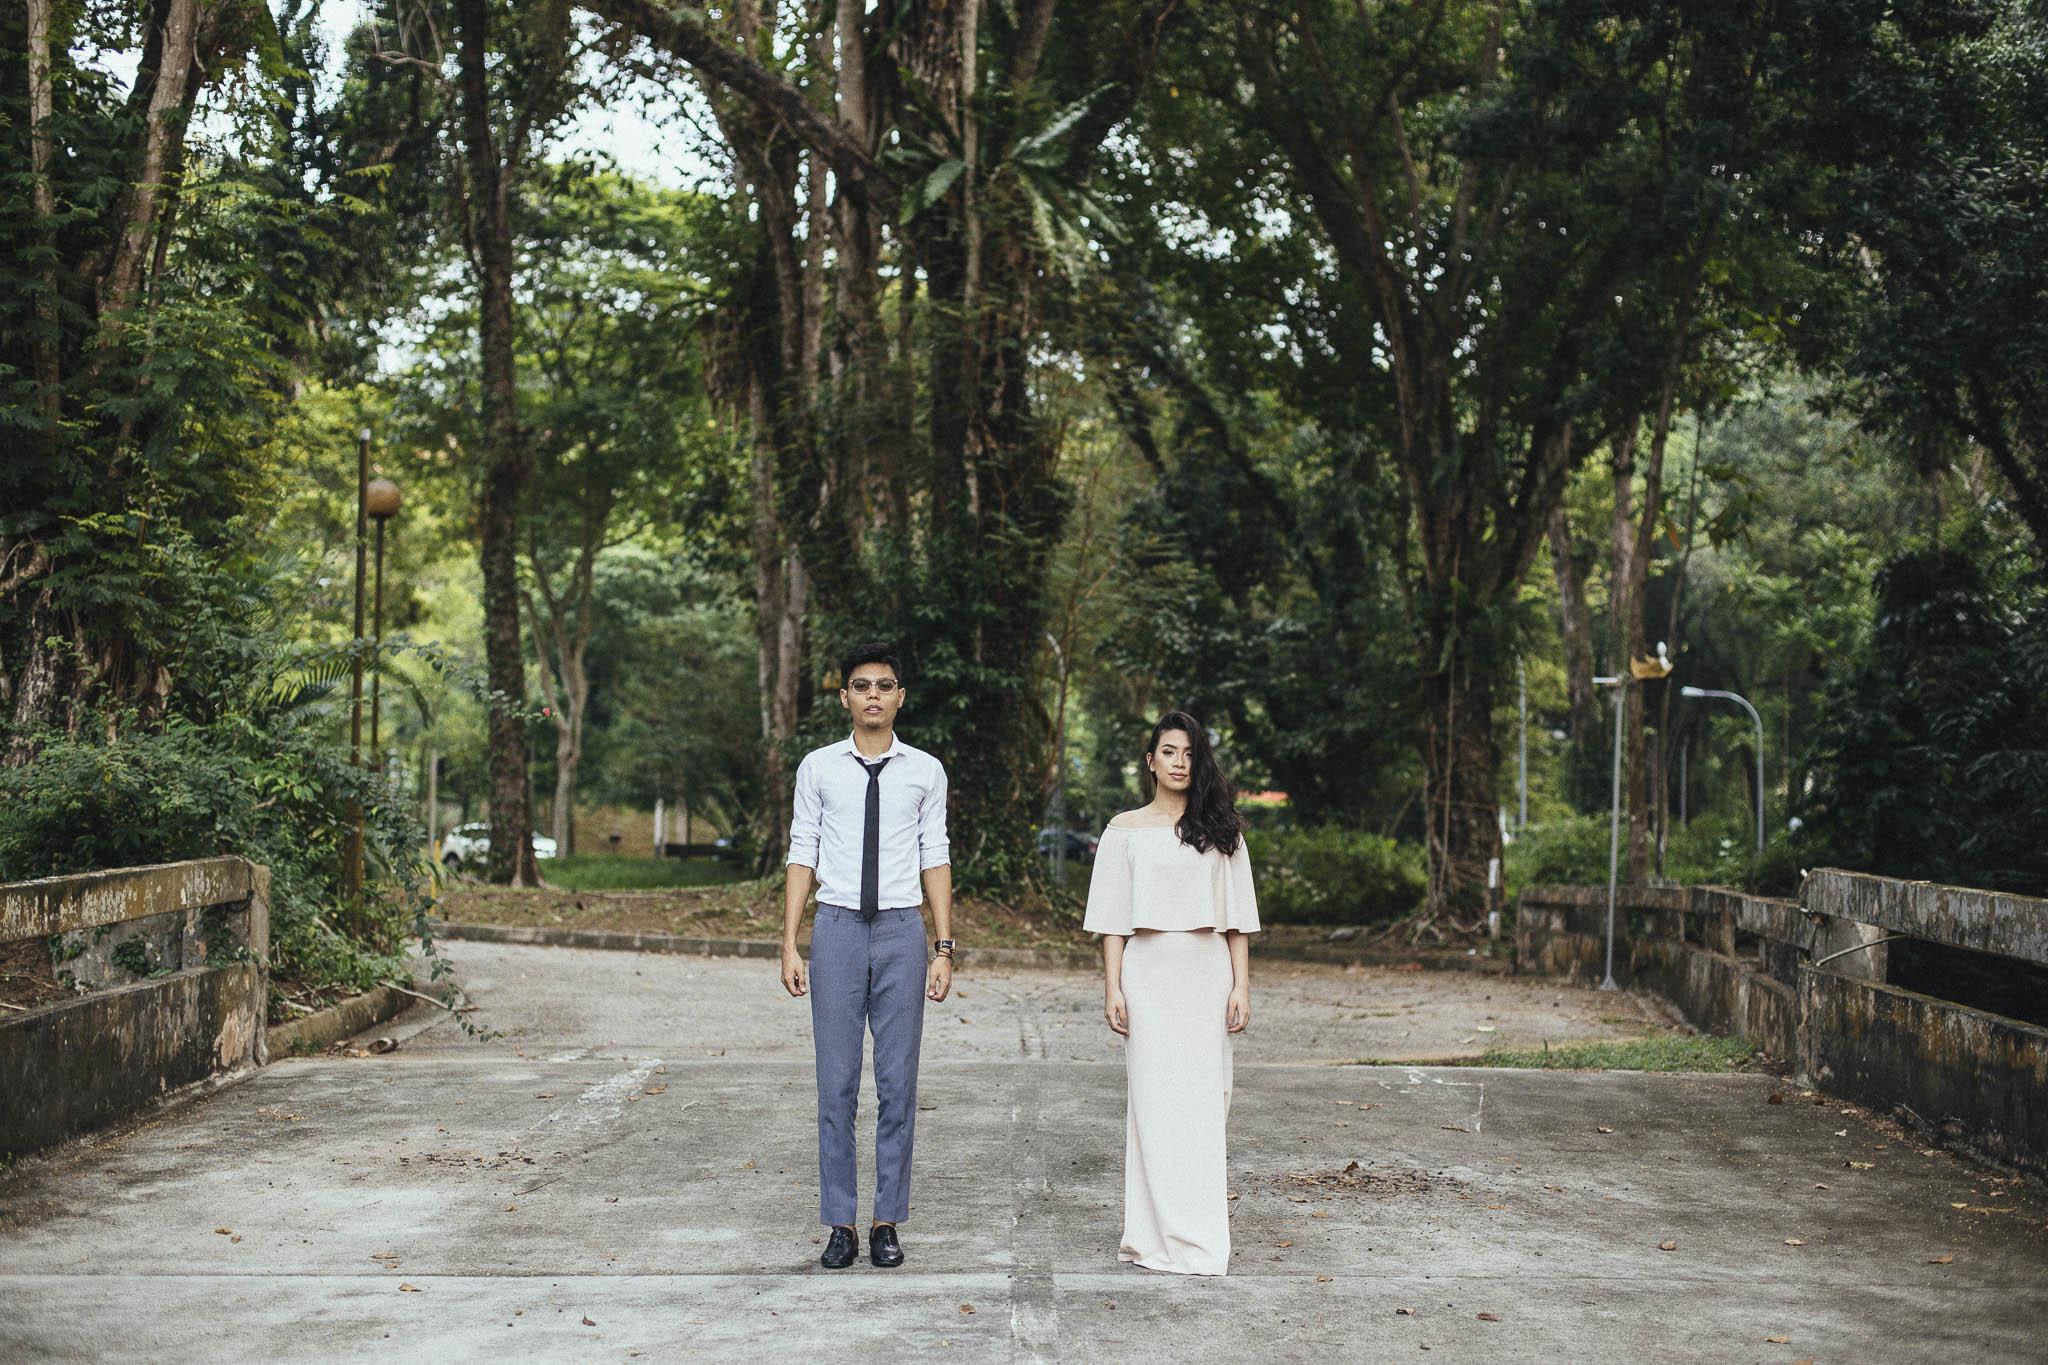 singapore-wedding-photographer-malay-travel-adli-tashah-09.jpg